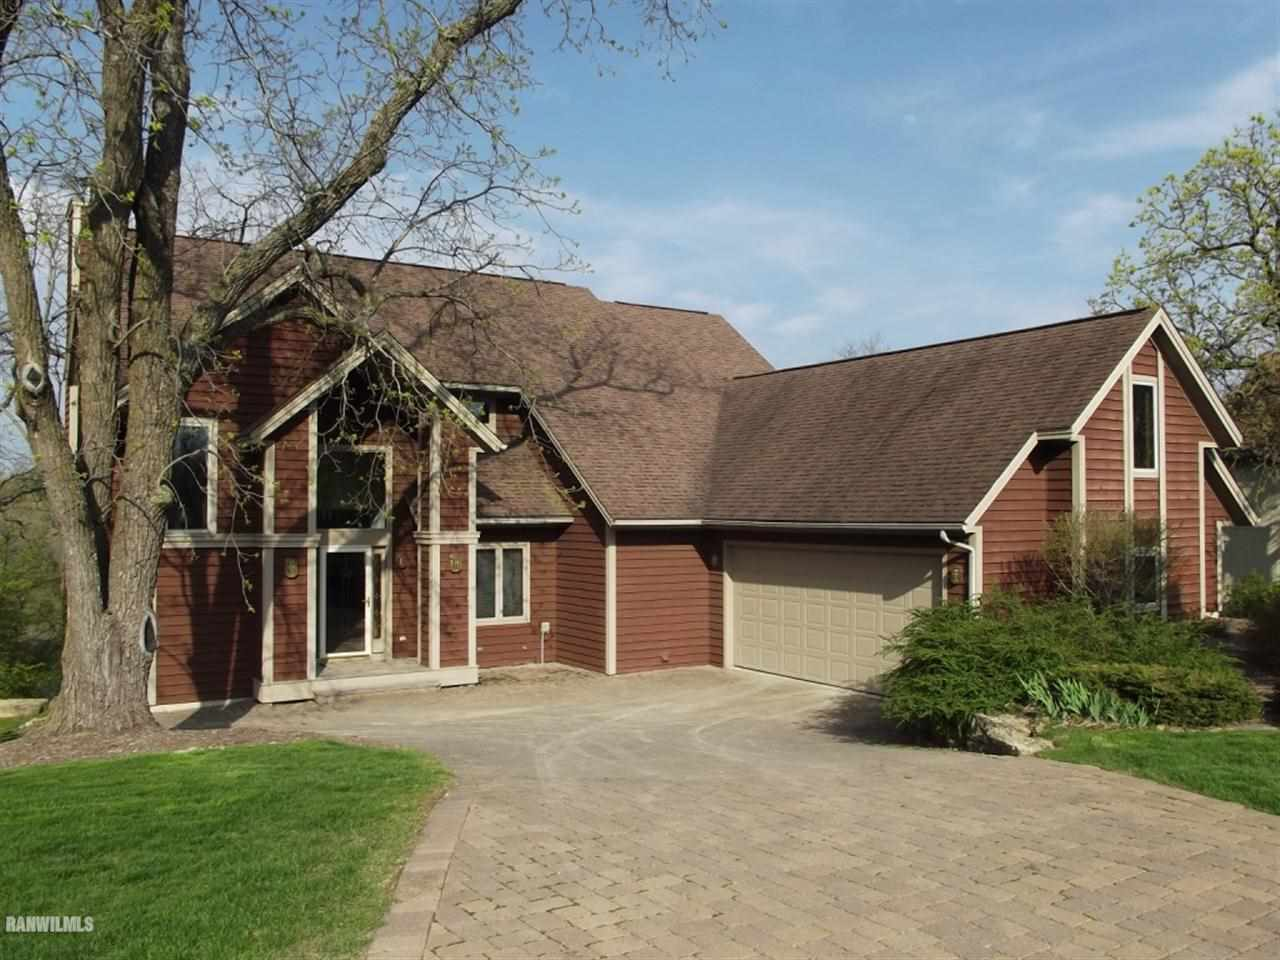 Real Estate for Sale, ListingId: 27143492, Apple River,IL61001